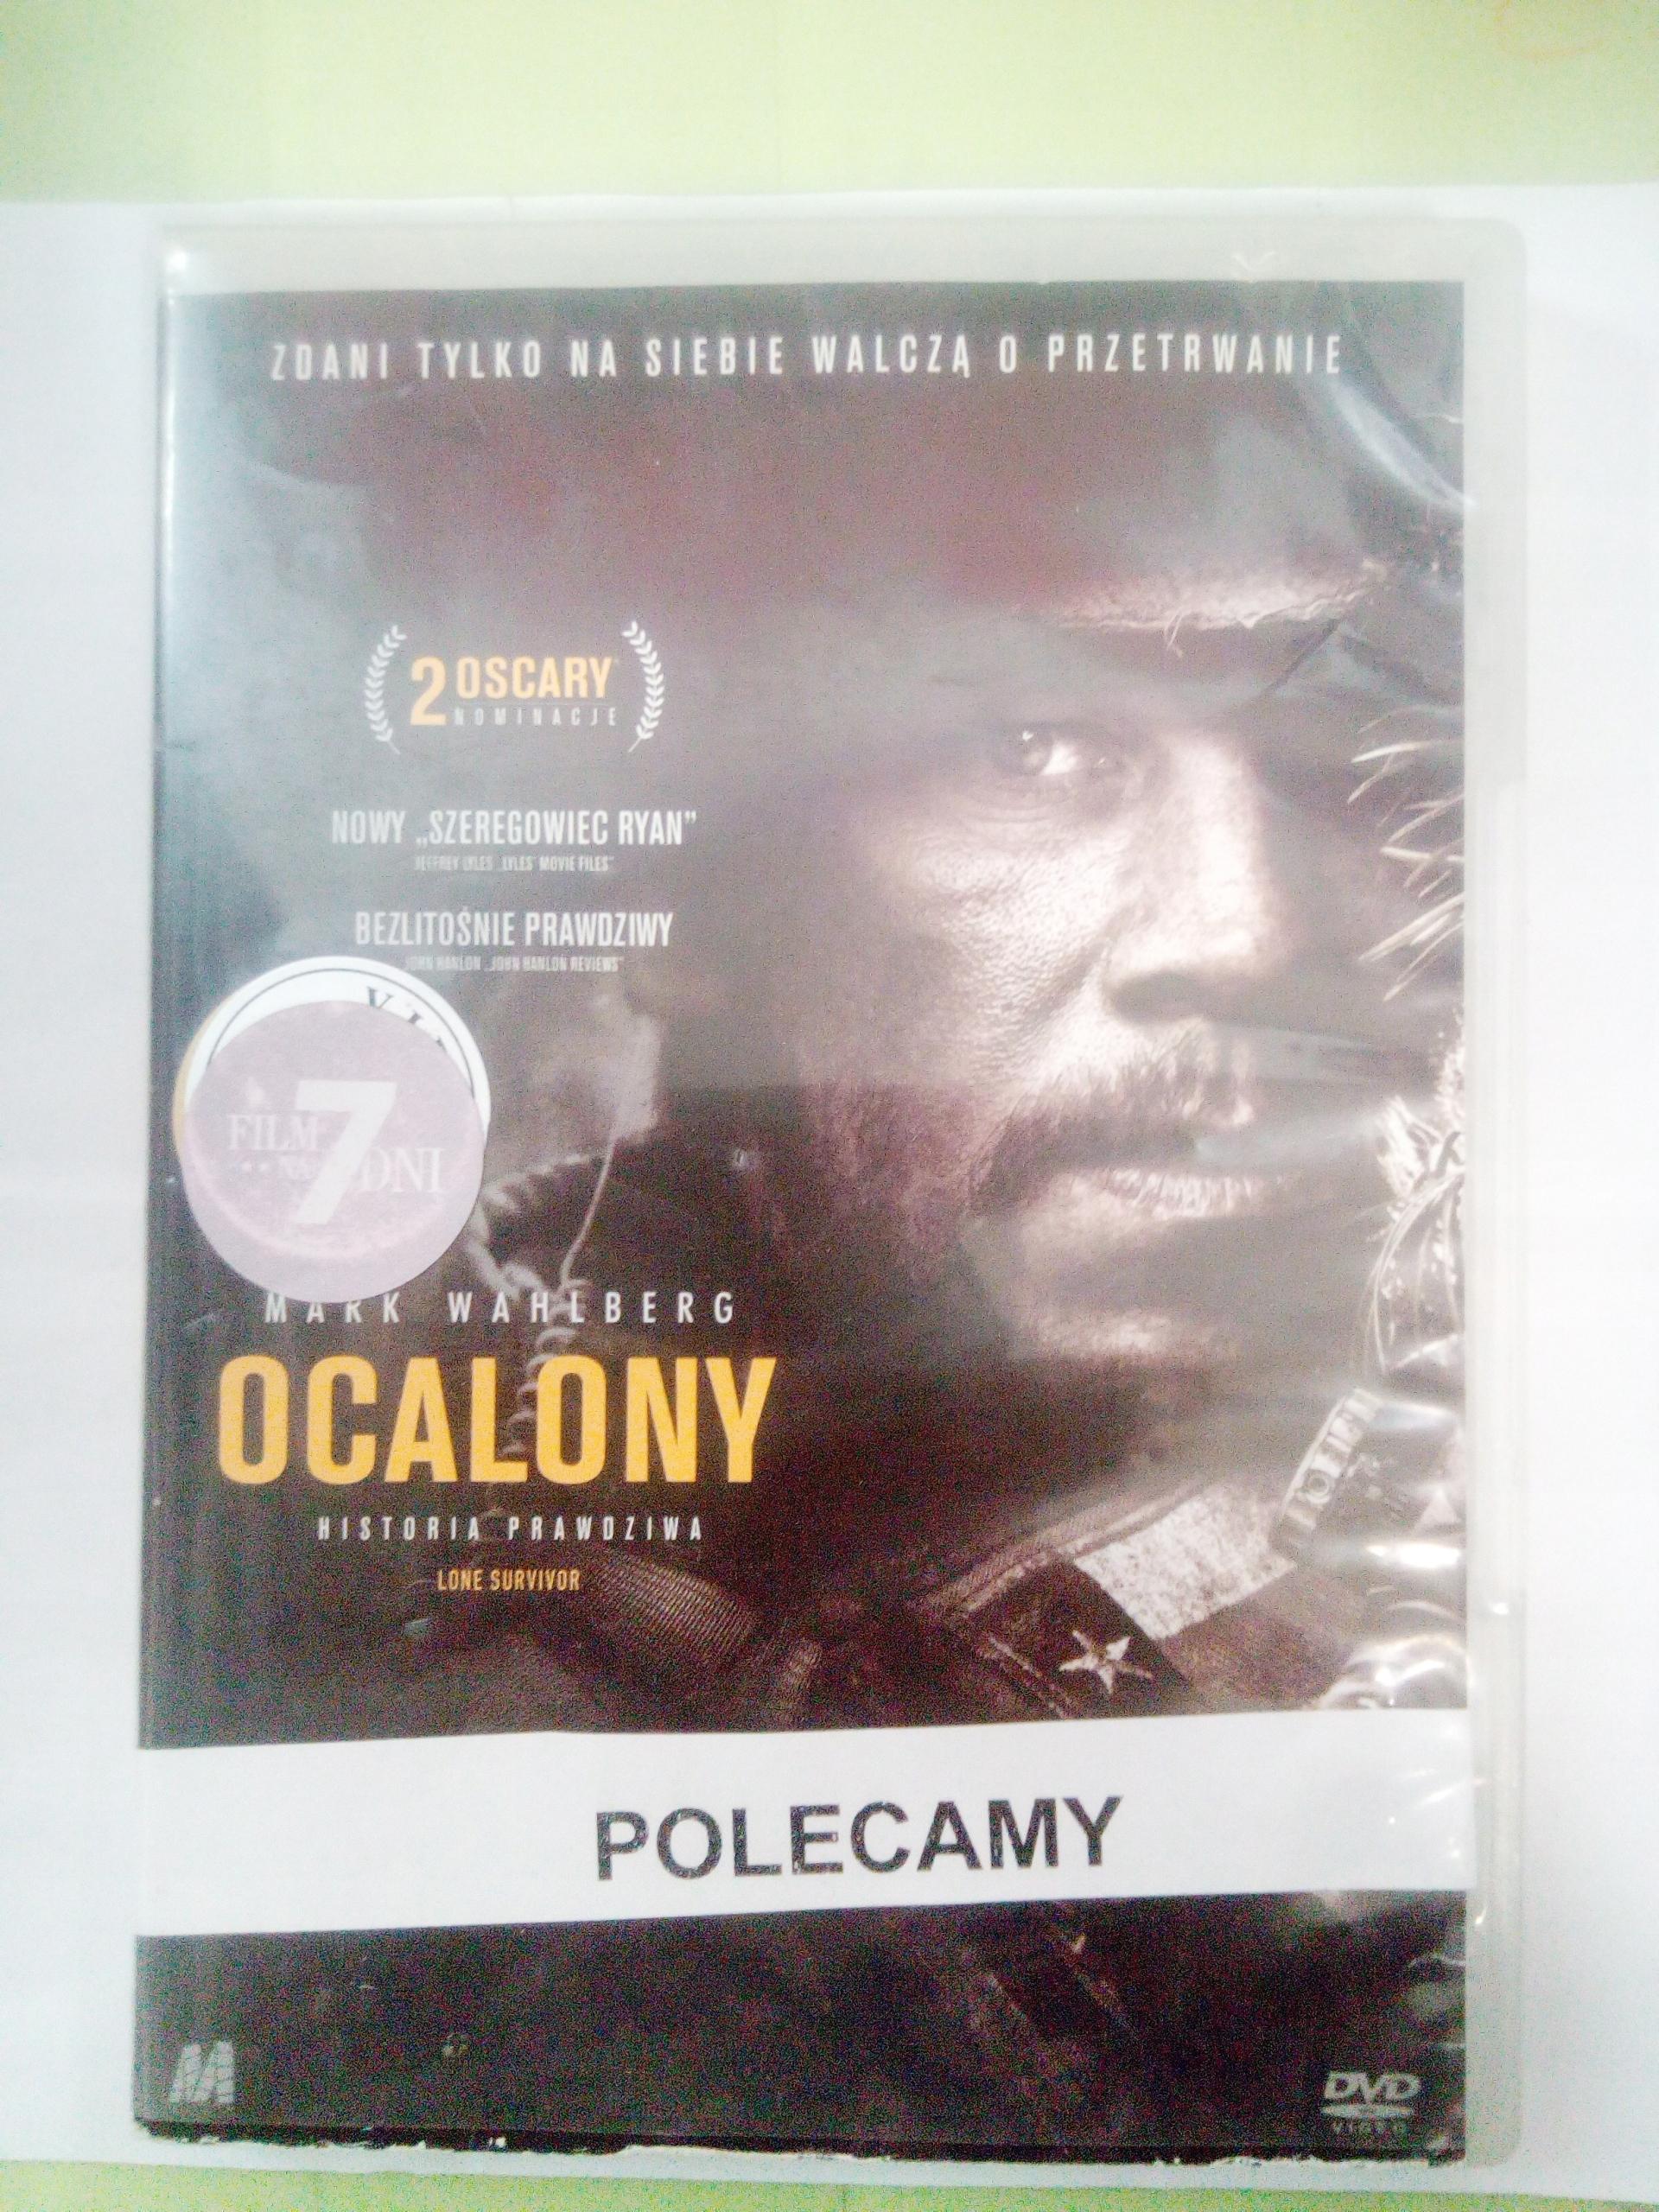 OCALONY DVD SKLEP VIDEOTEKA TYCHY